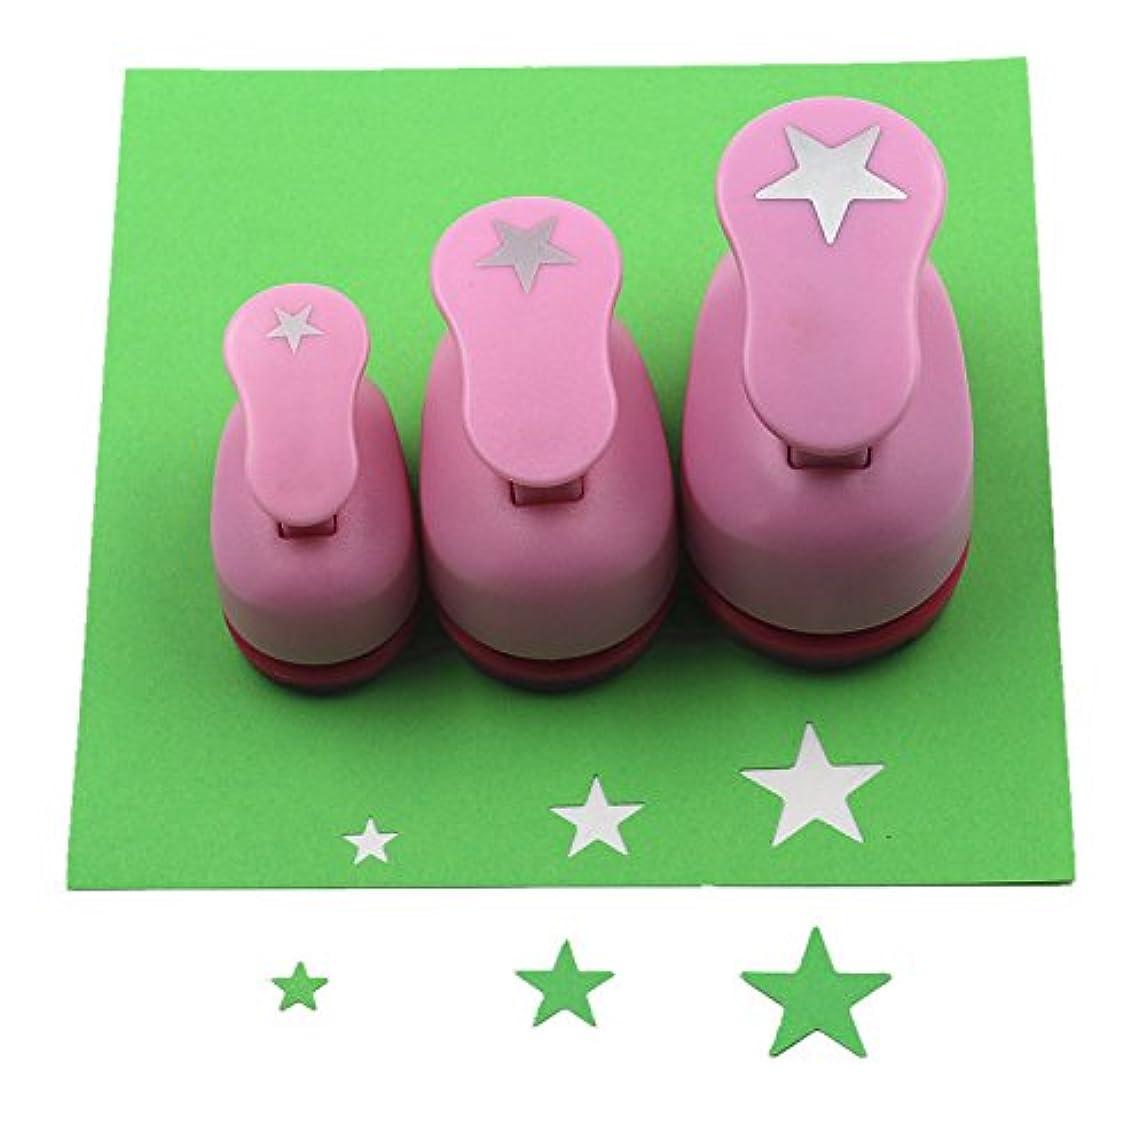 CADY Crafts Punch Set 8mm 15mm 25mm Paper Punches 3pcs/Set (Star) qhzvo94063670797